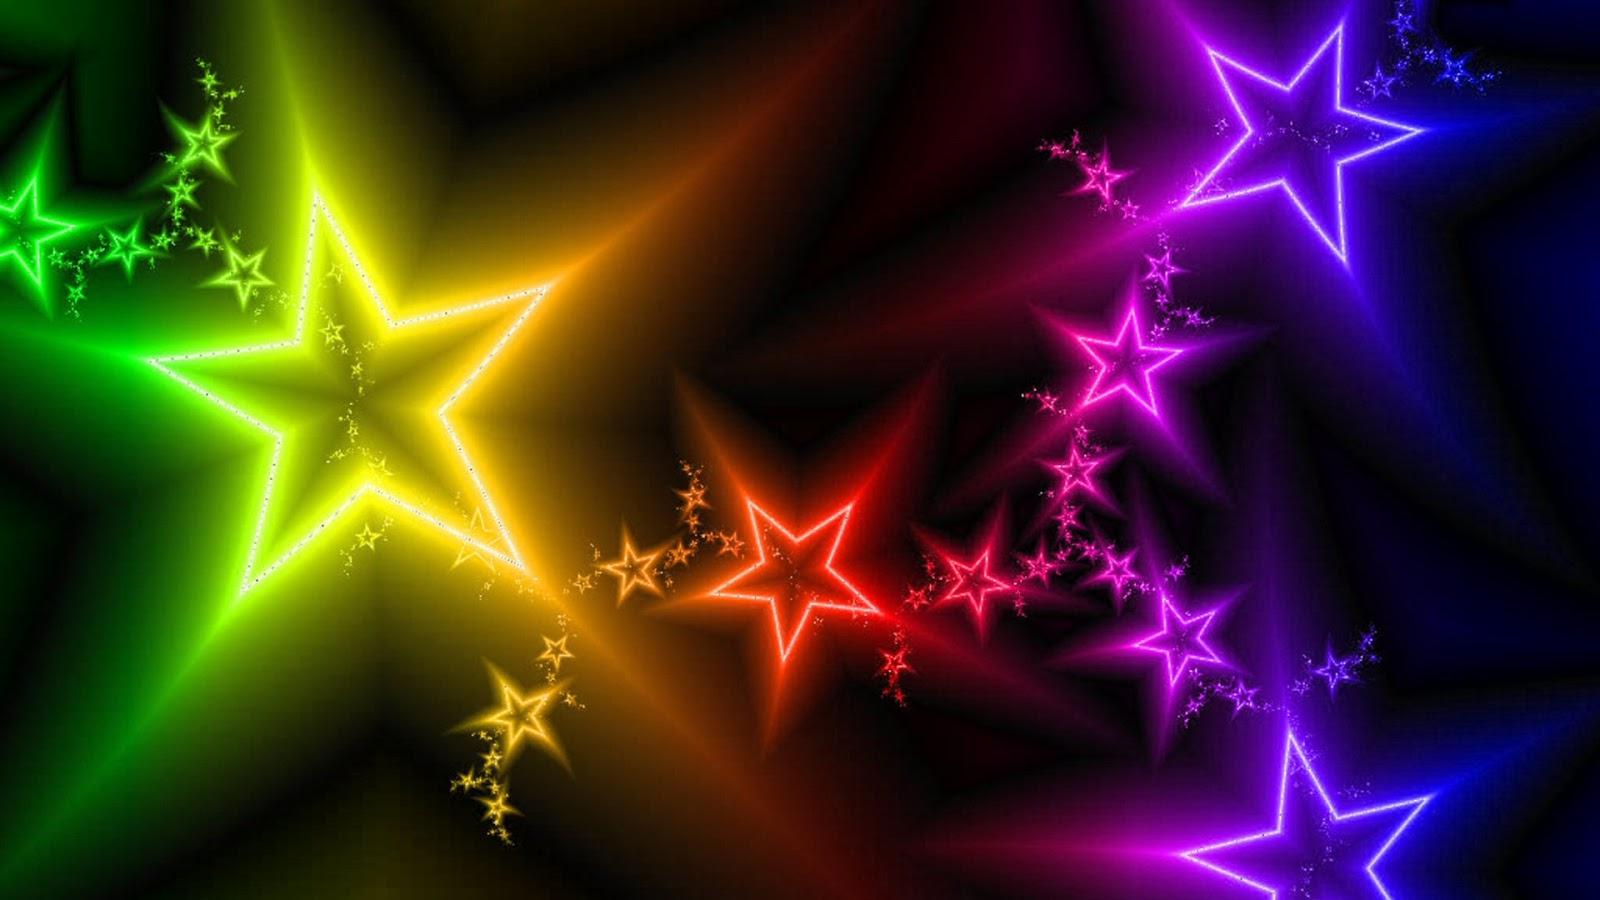 star wars desktop wallpapers moving